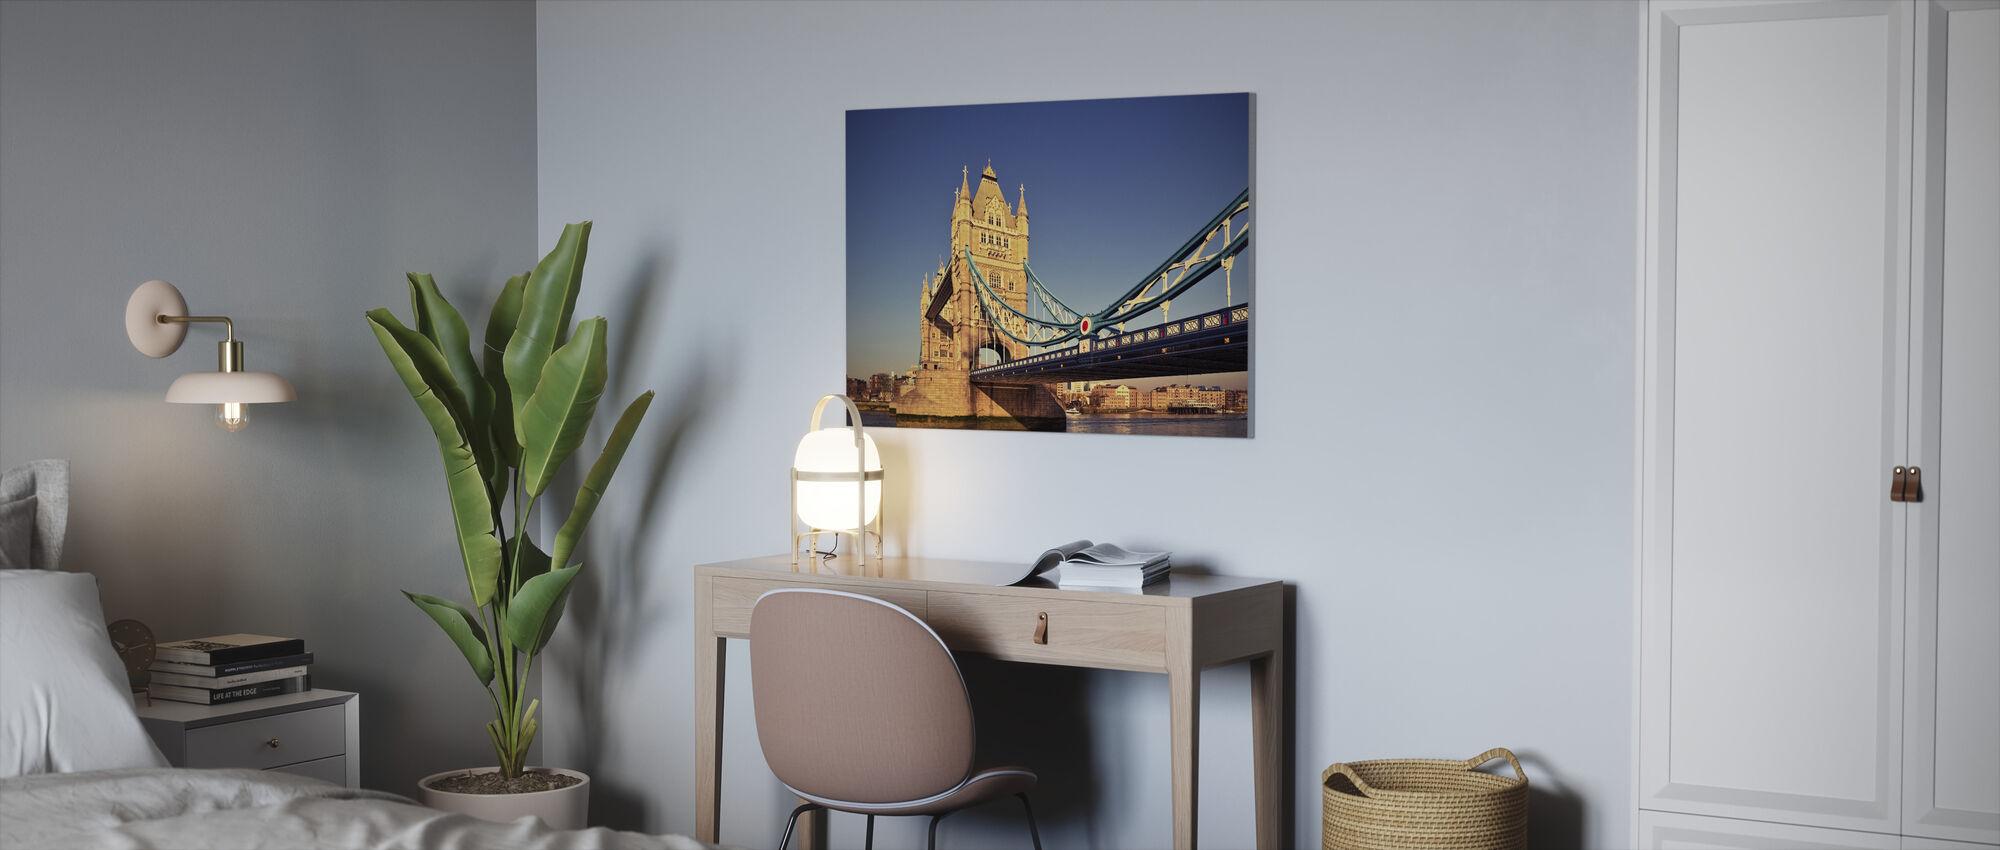 Tårnbro i solskinn - Lerretsbilde - Kontor